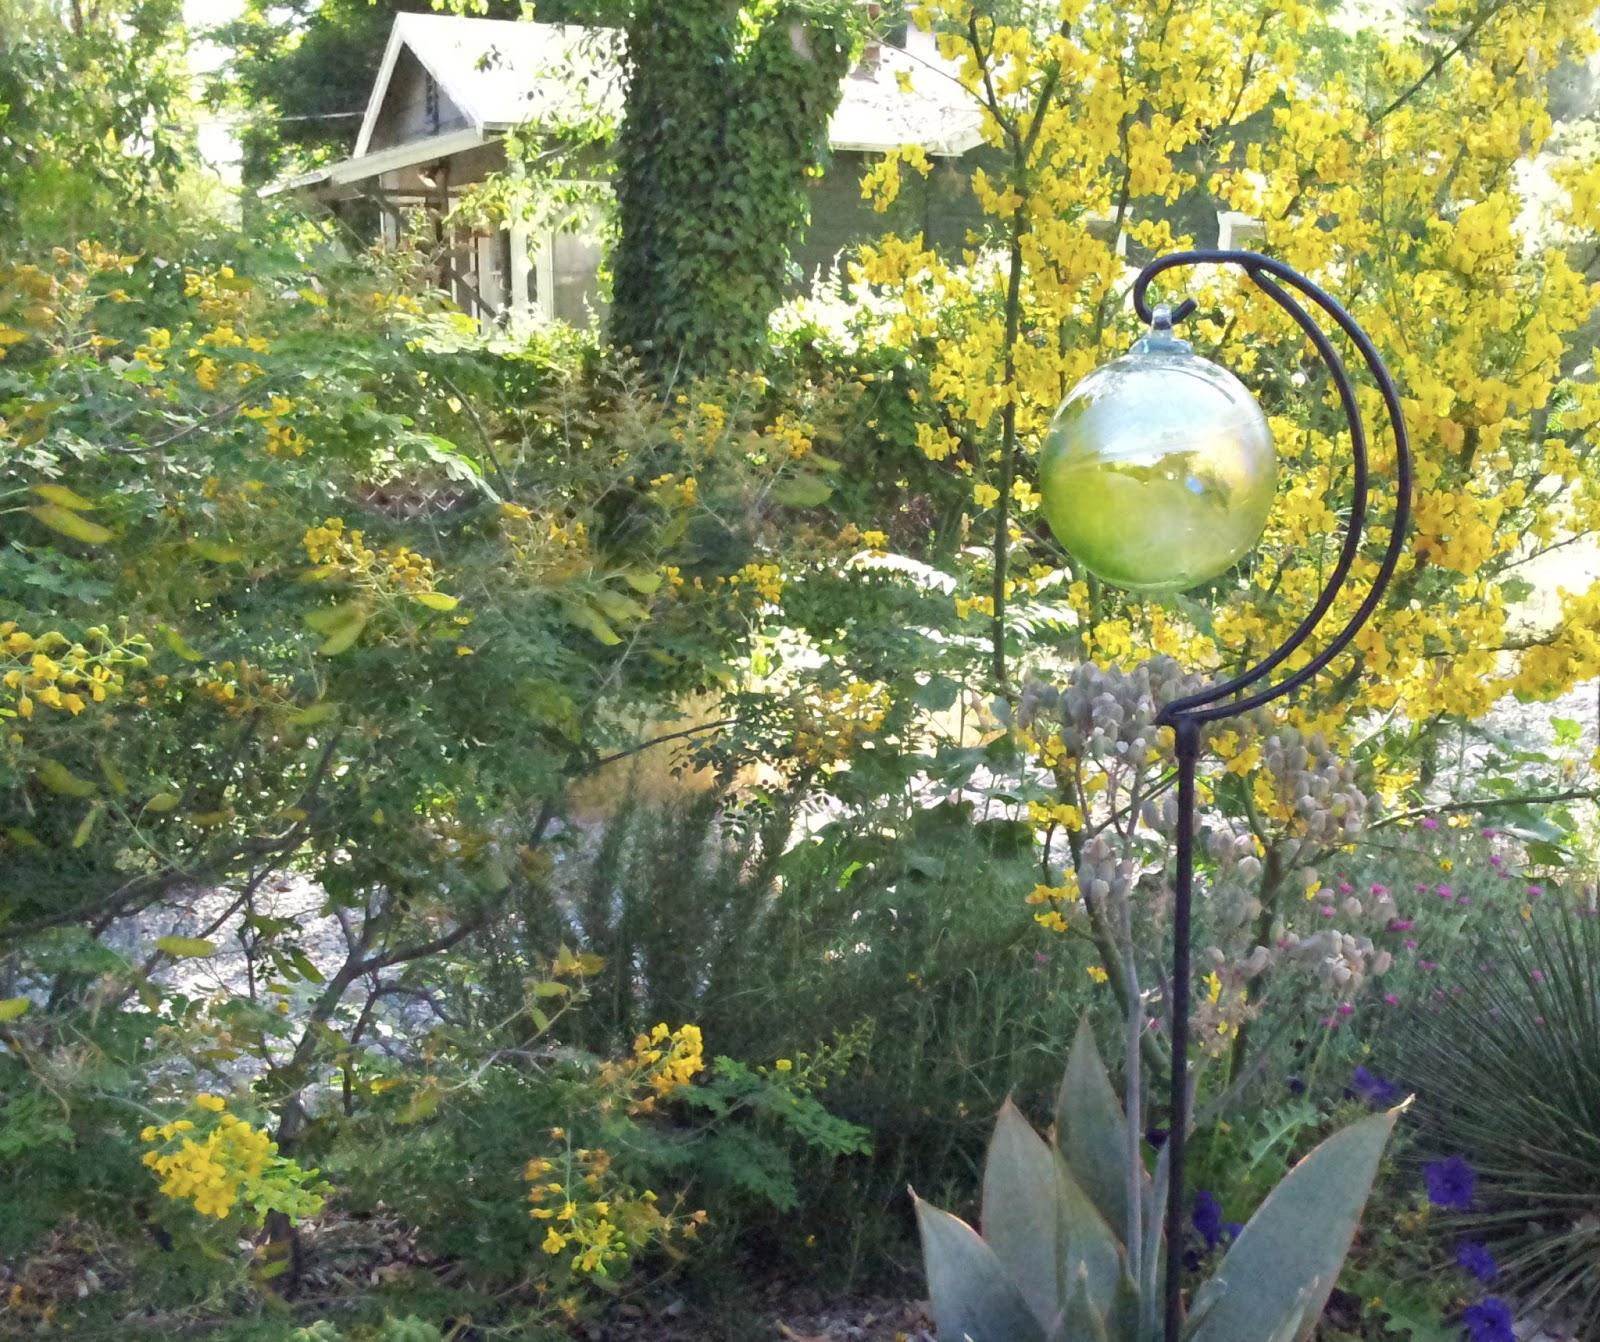 15 Outstanding Contemporary Landscaping Ideas Your Garden: Shop Land & Garden At Www.landngarden.com: Adding Gazing